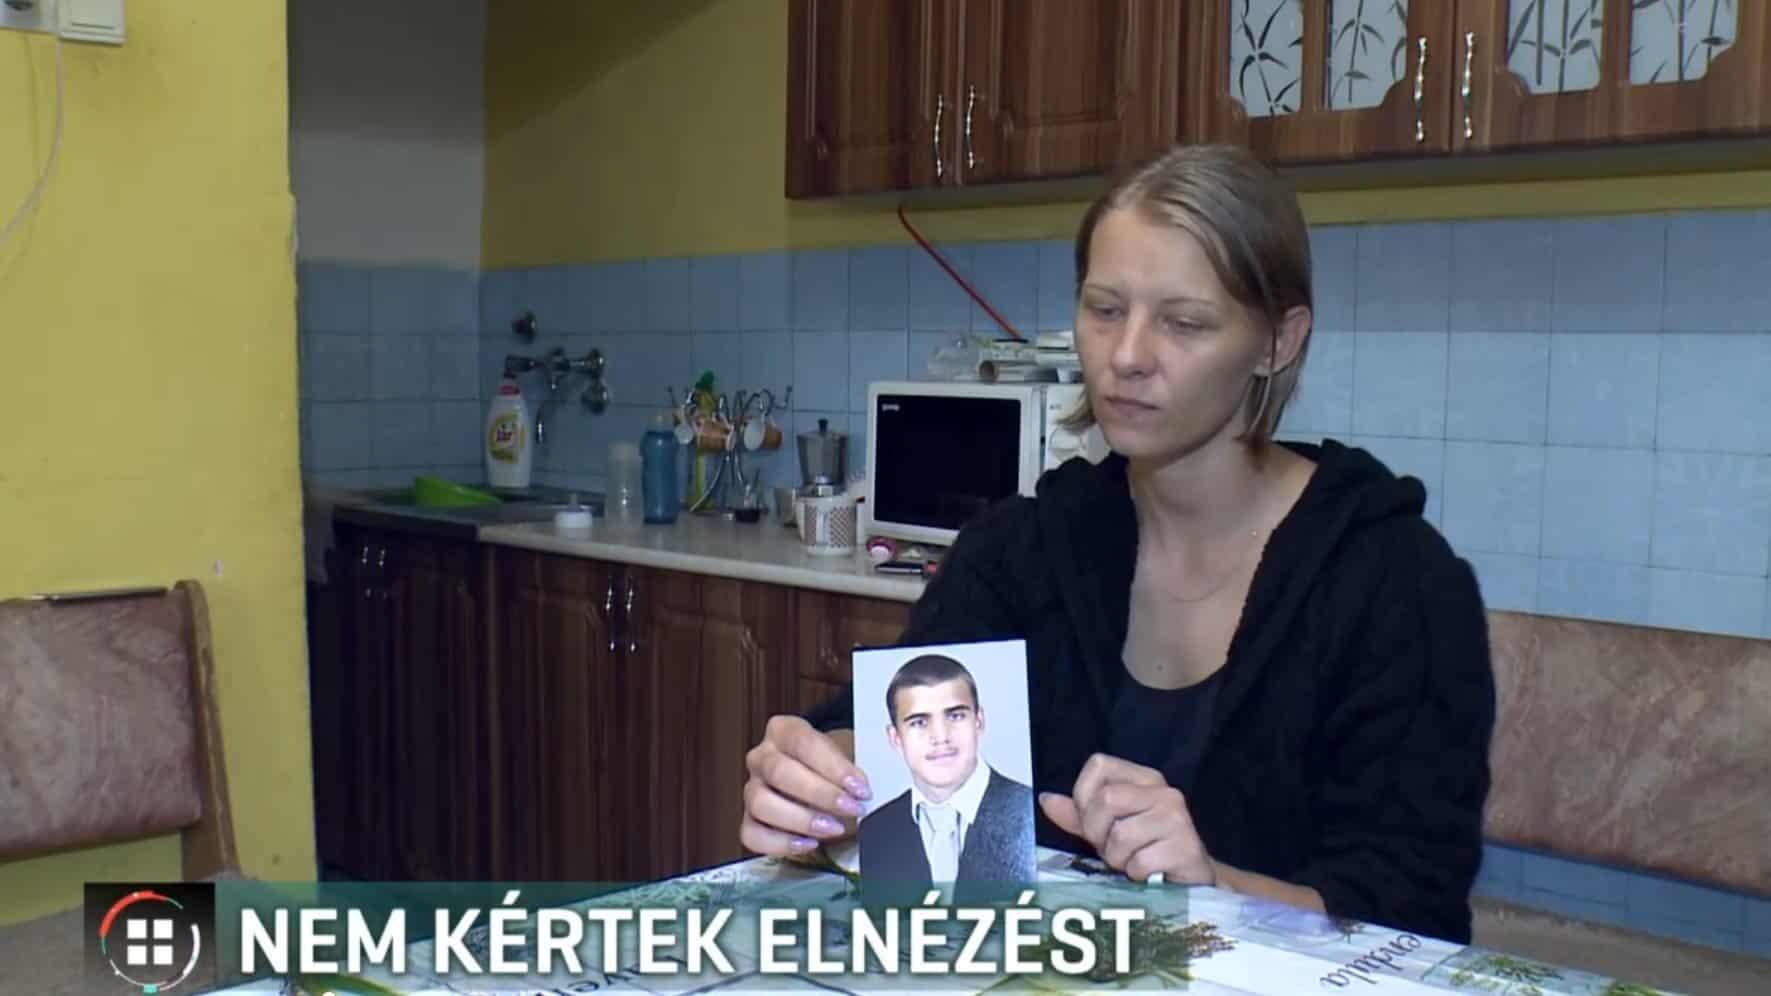 Tisza Gabor Vaja Anyja Lovas Edina Ongyilkossag